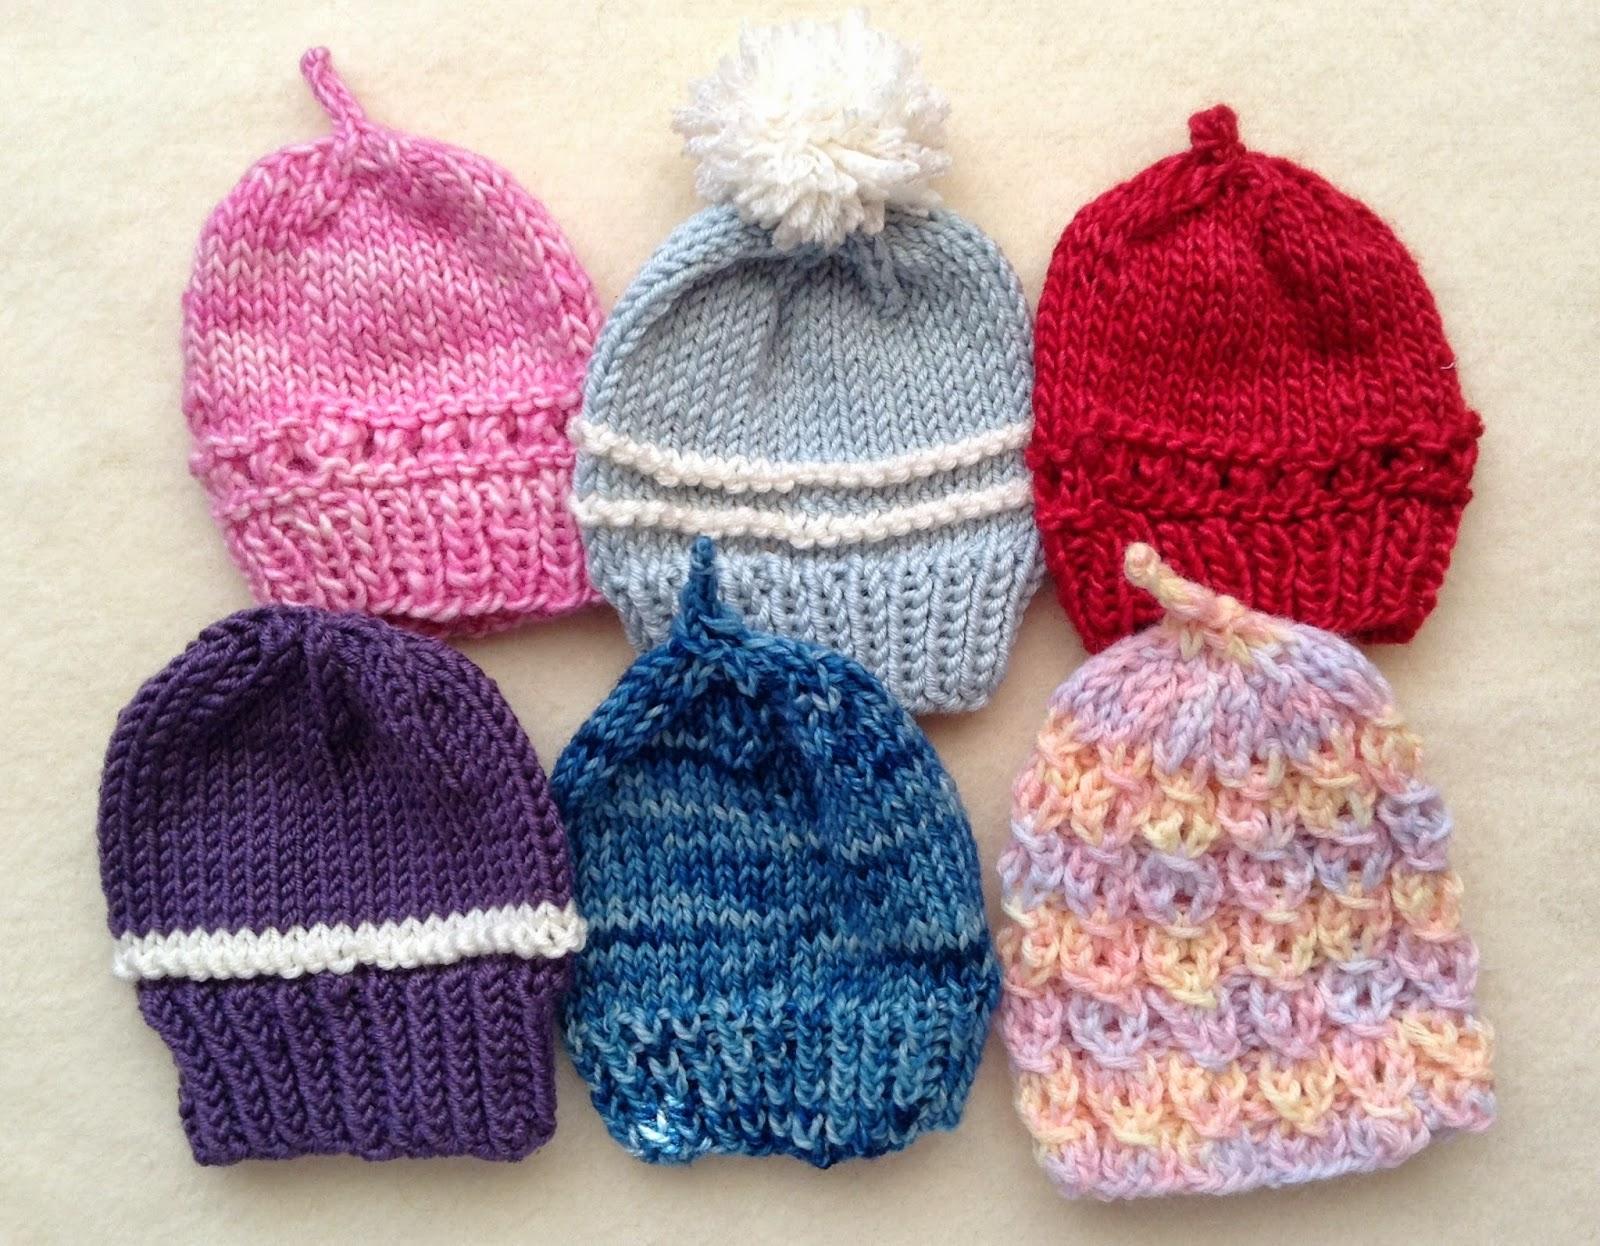 Knitting for Peace: Preemie Hats I